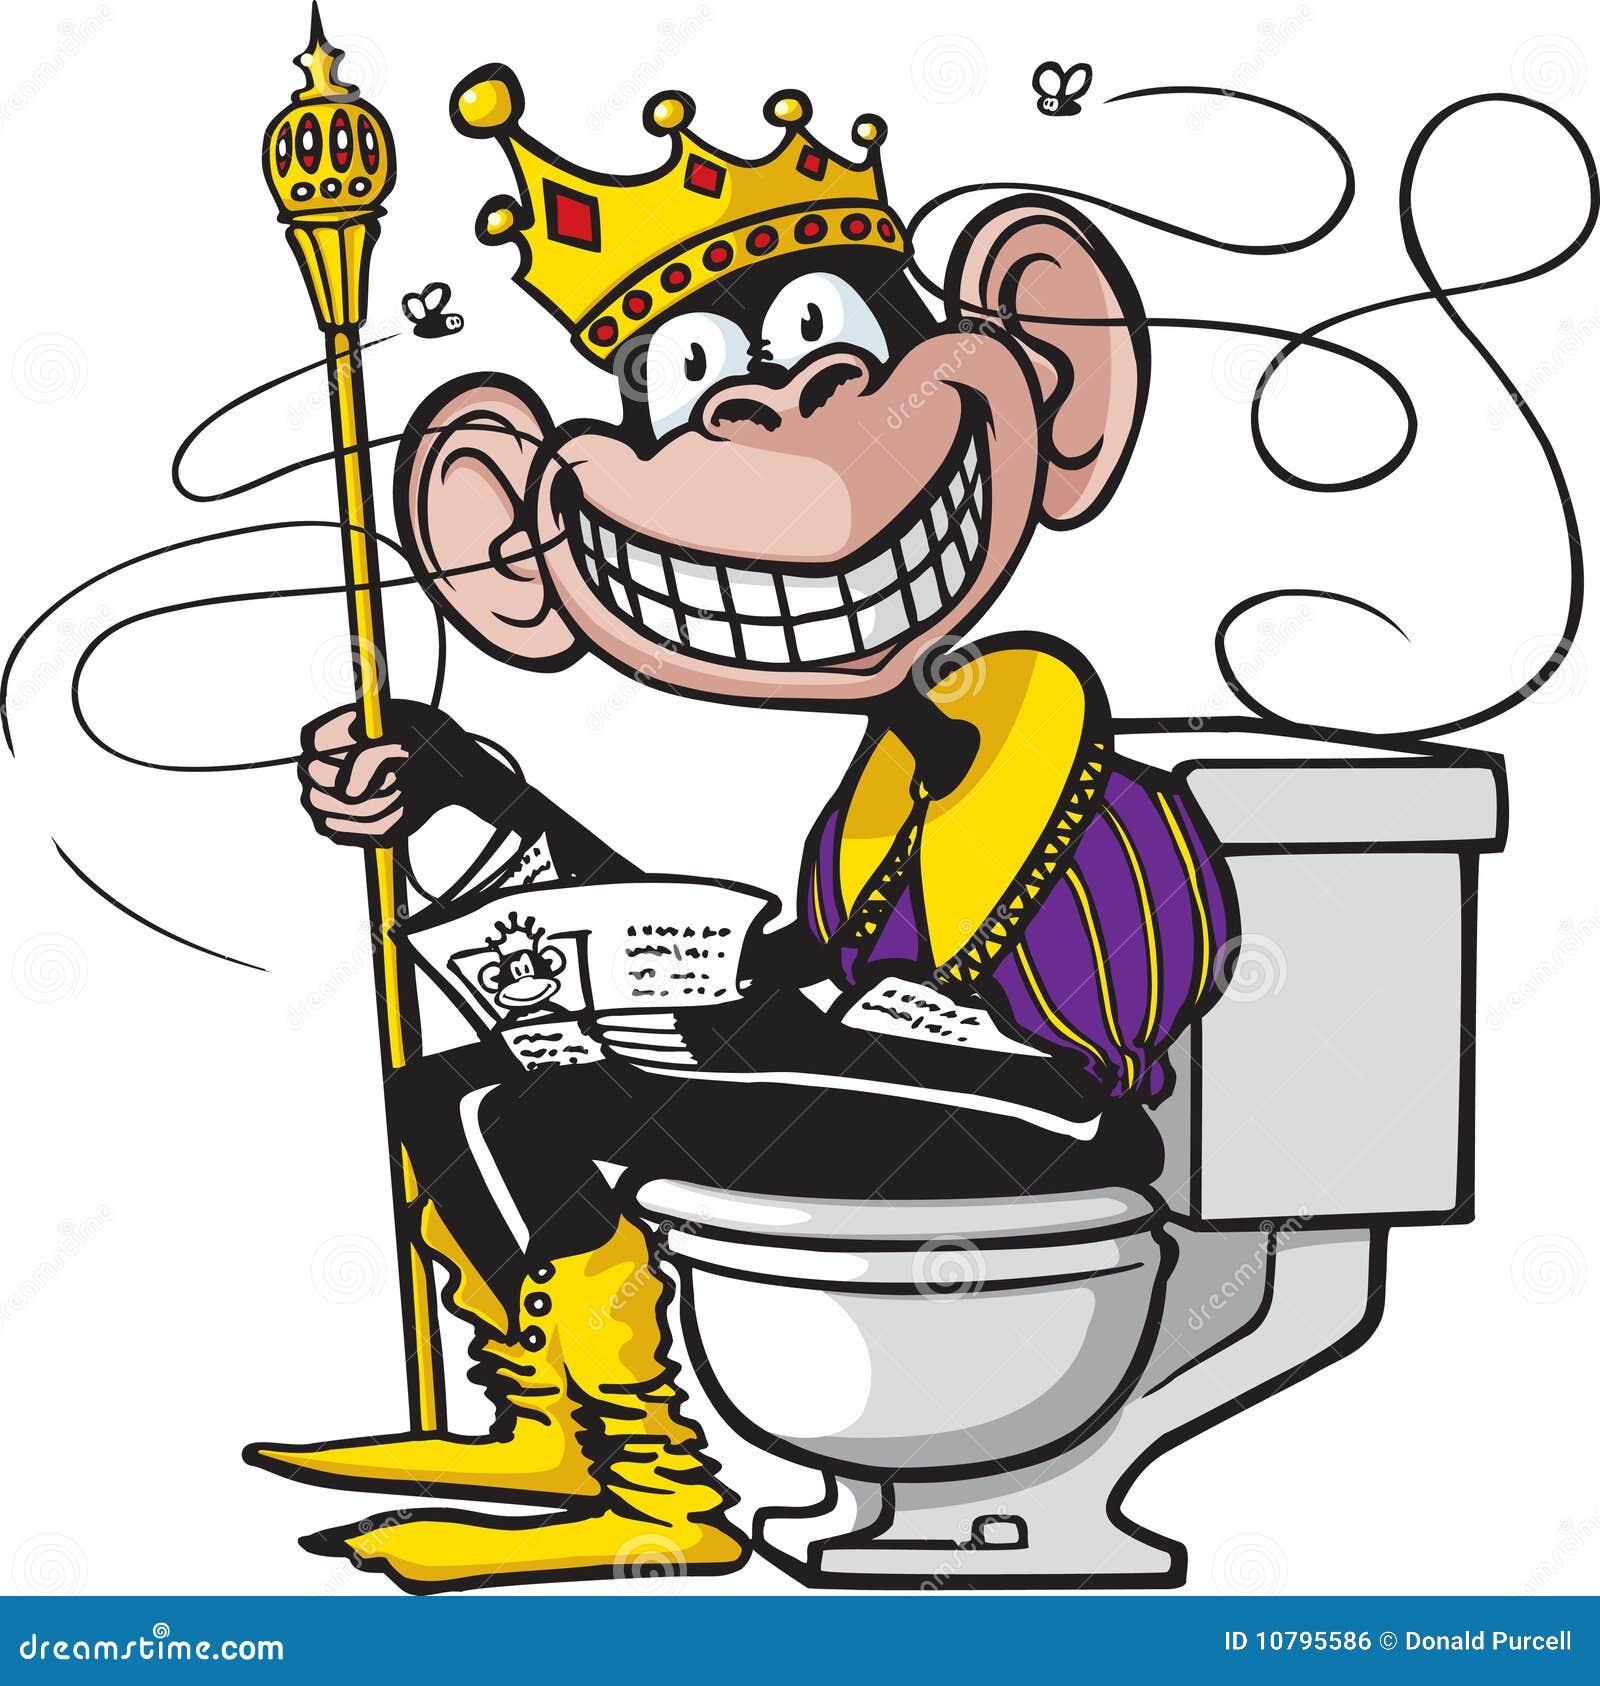 Casino Royale Bathroom Fight: Royal Flush Stock Vector. Image Of Chimpanzee, Commode